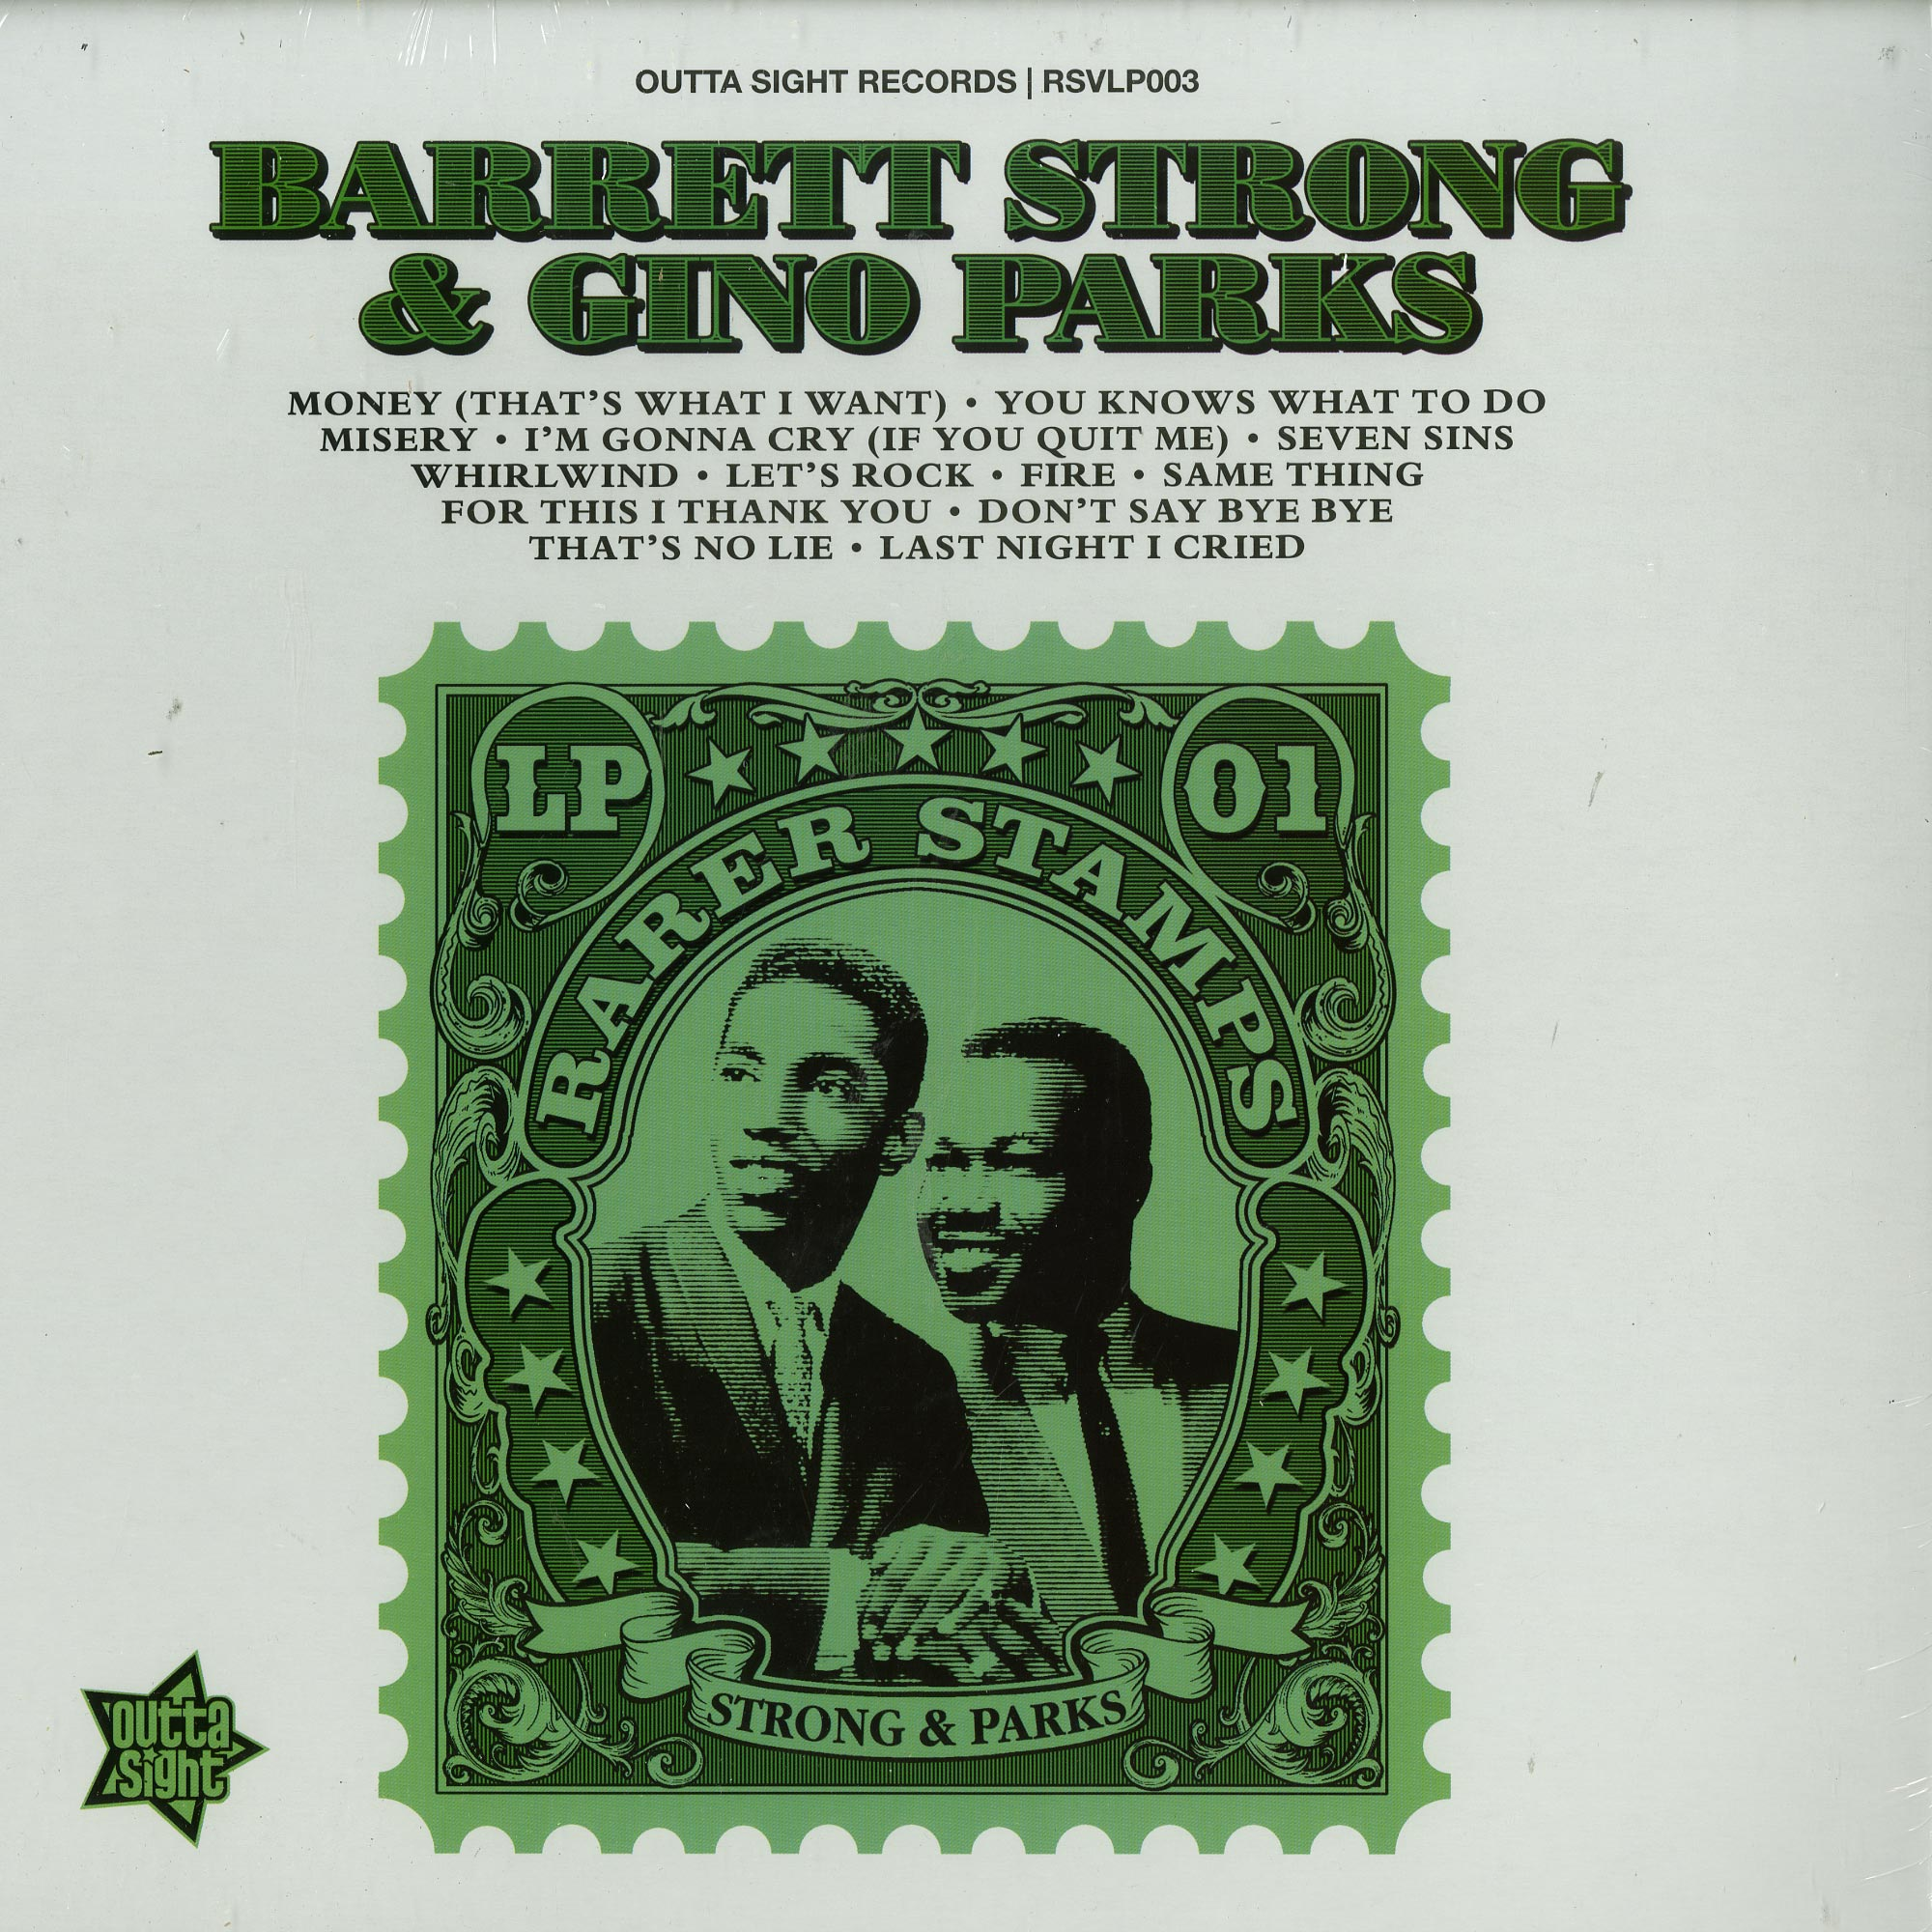 Barrett Strong / Gino Parks - RARER STAMPS VOL.1